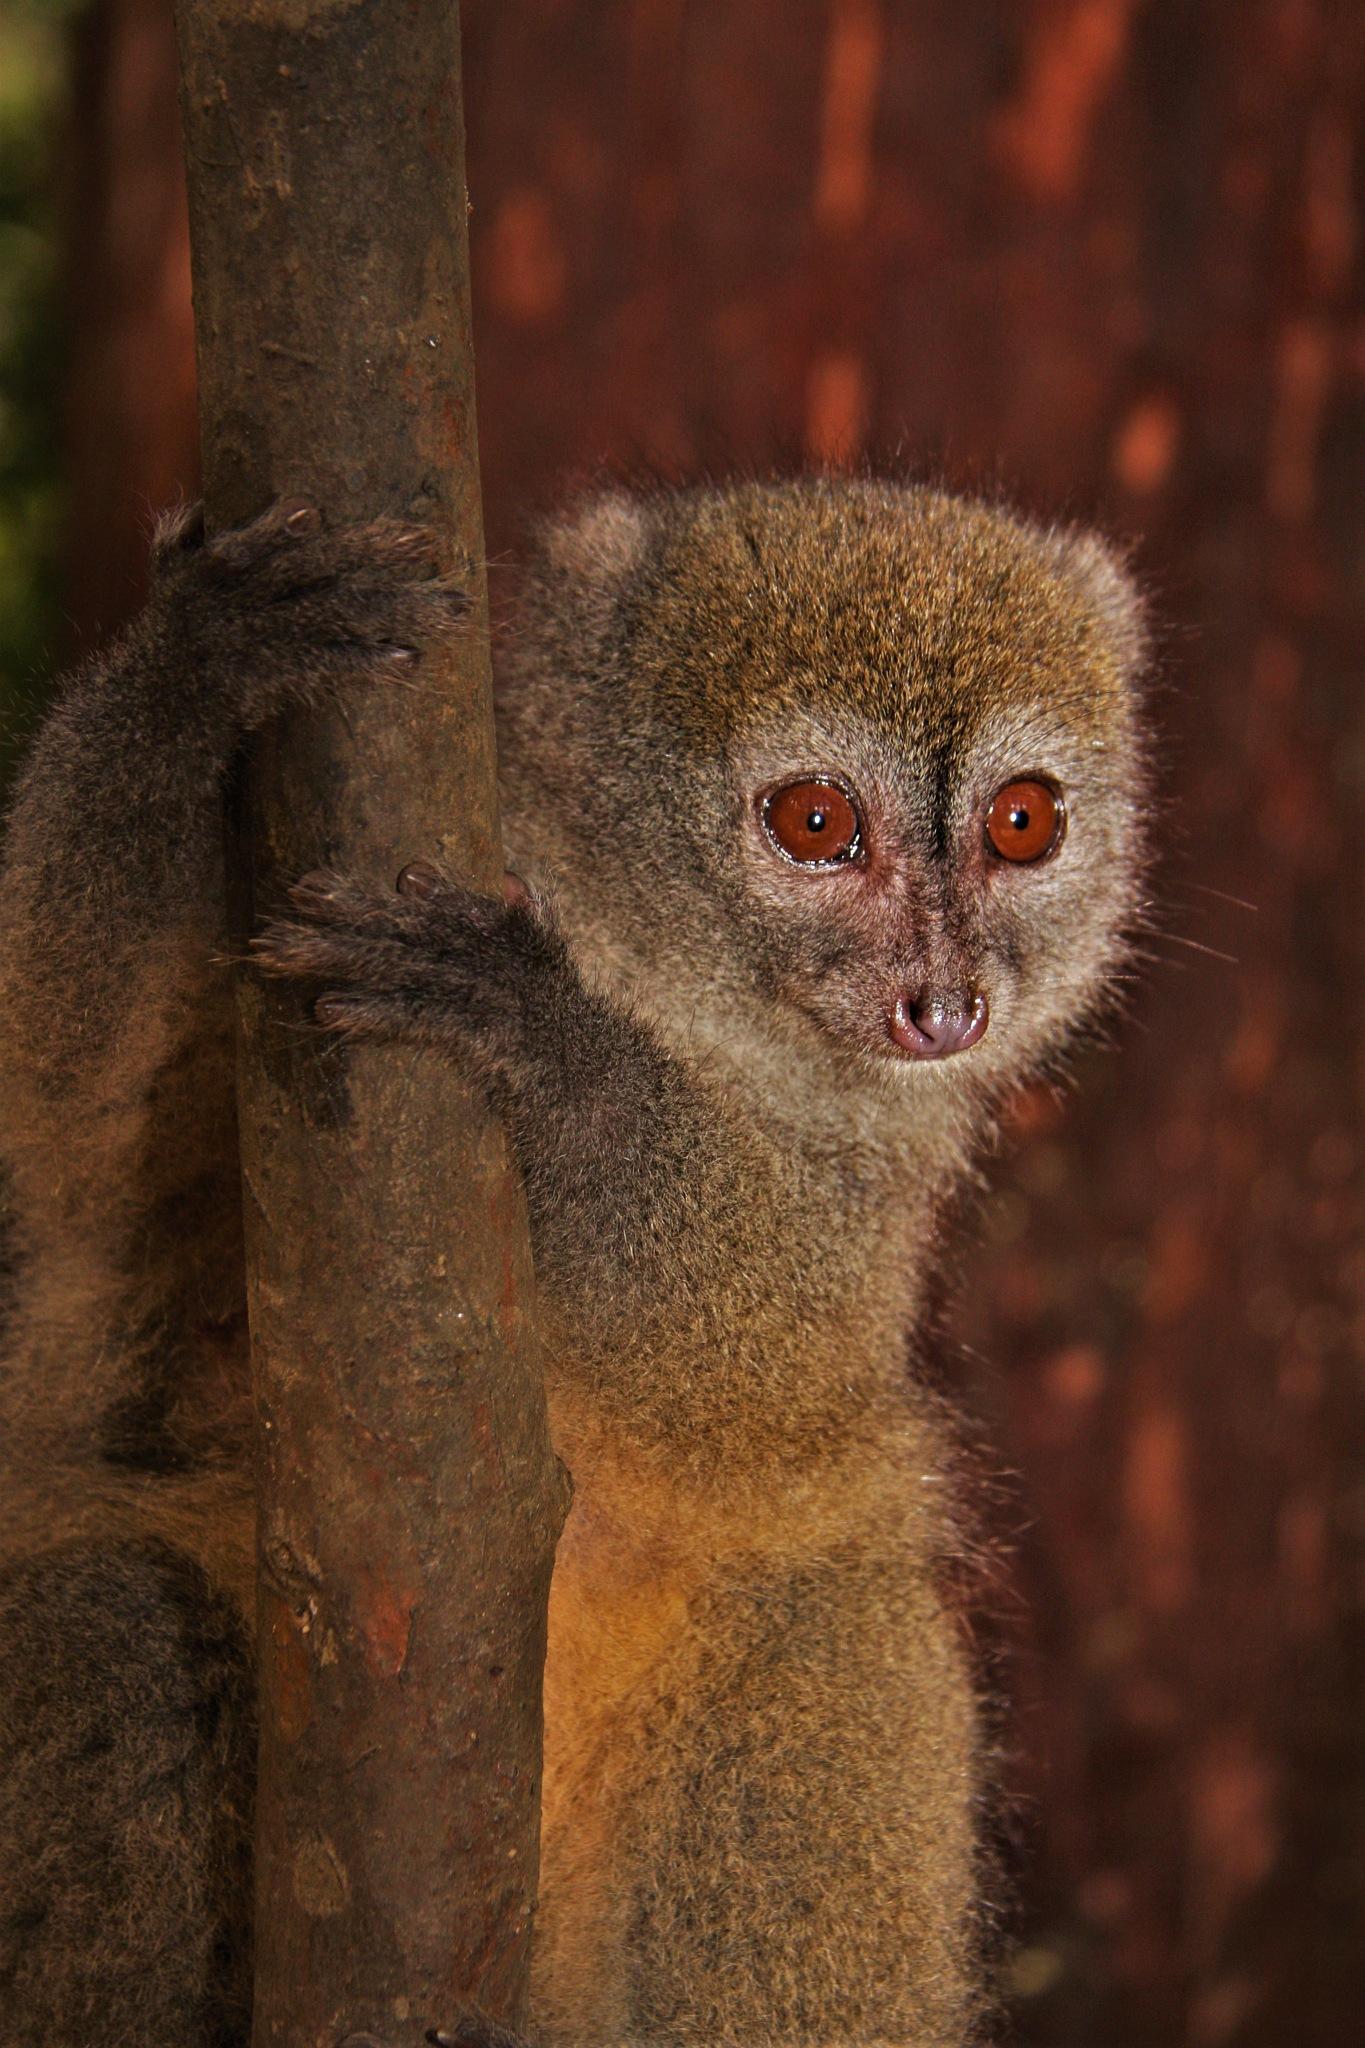 Bamboo  Lemur  by dittums12